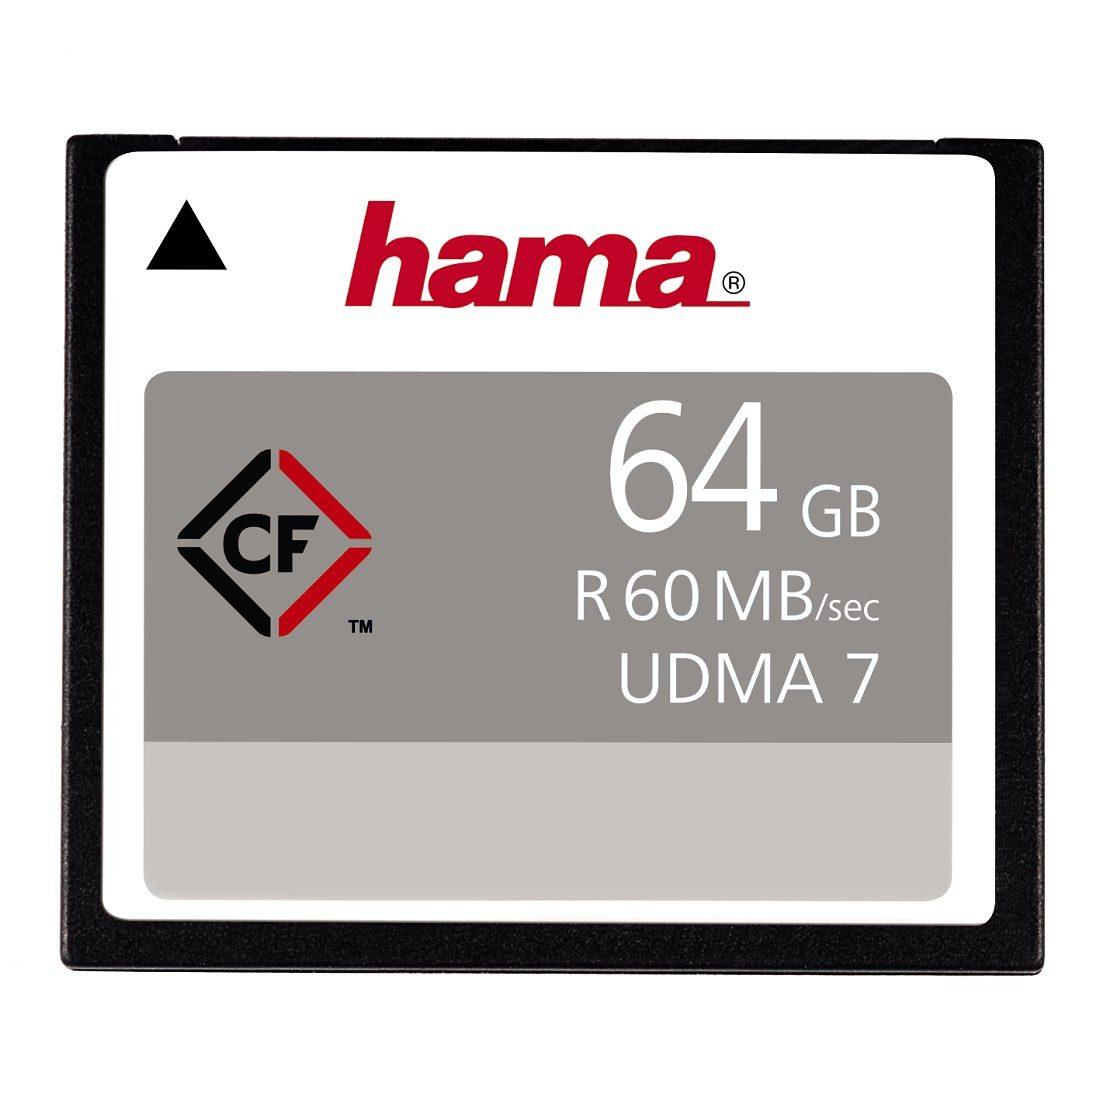 Hama Speicherkarte CompactFlash 64GB 60MB/s